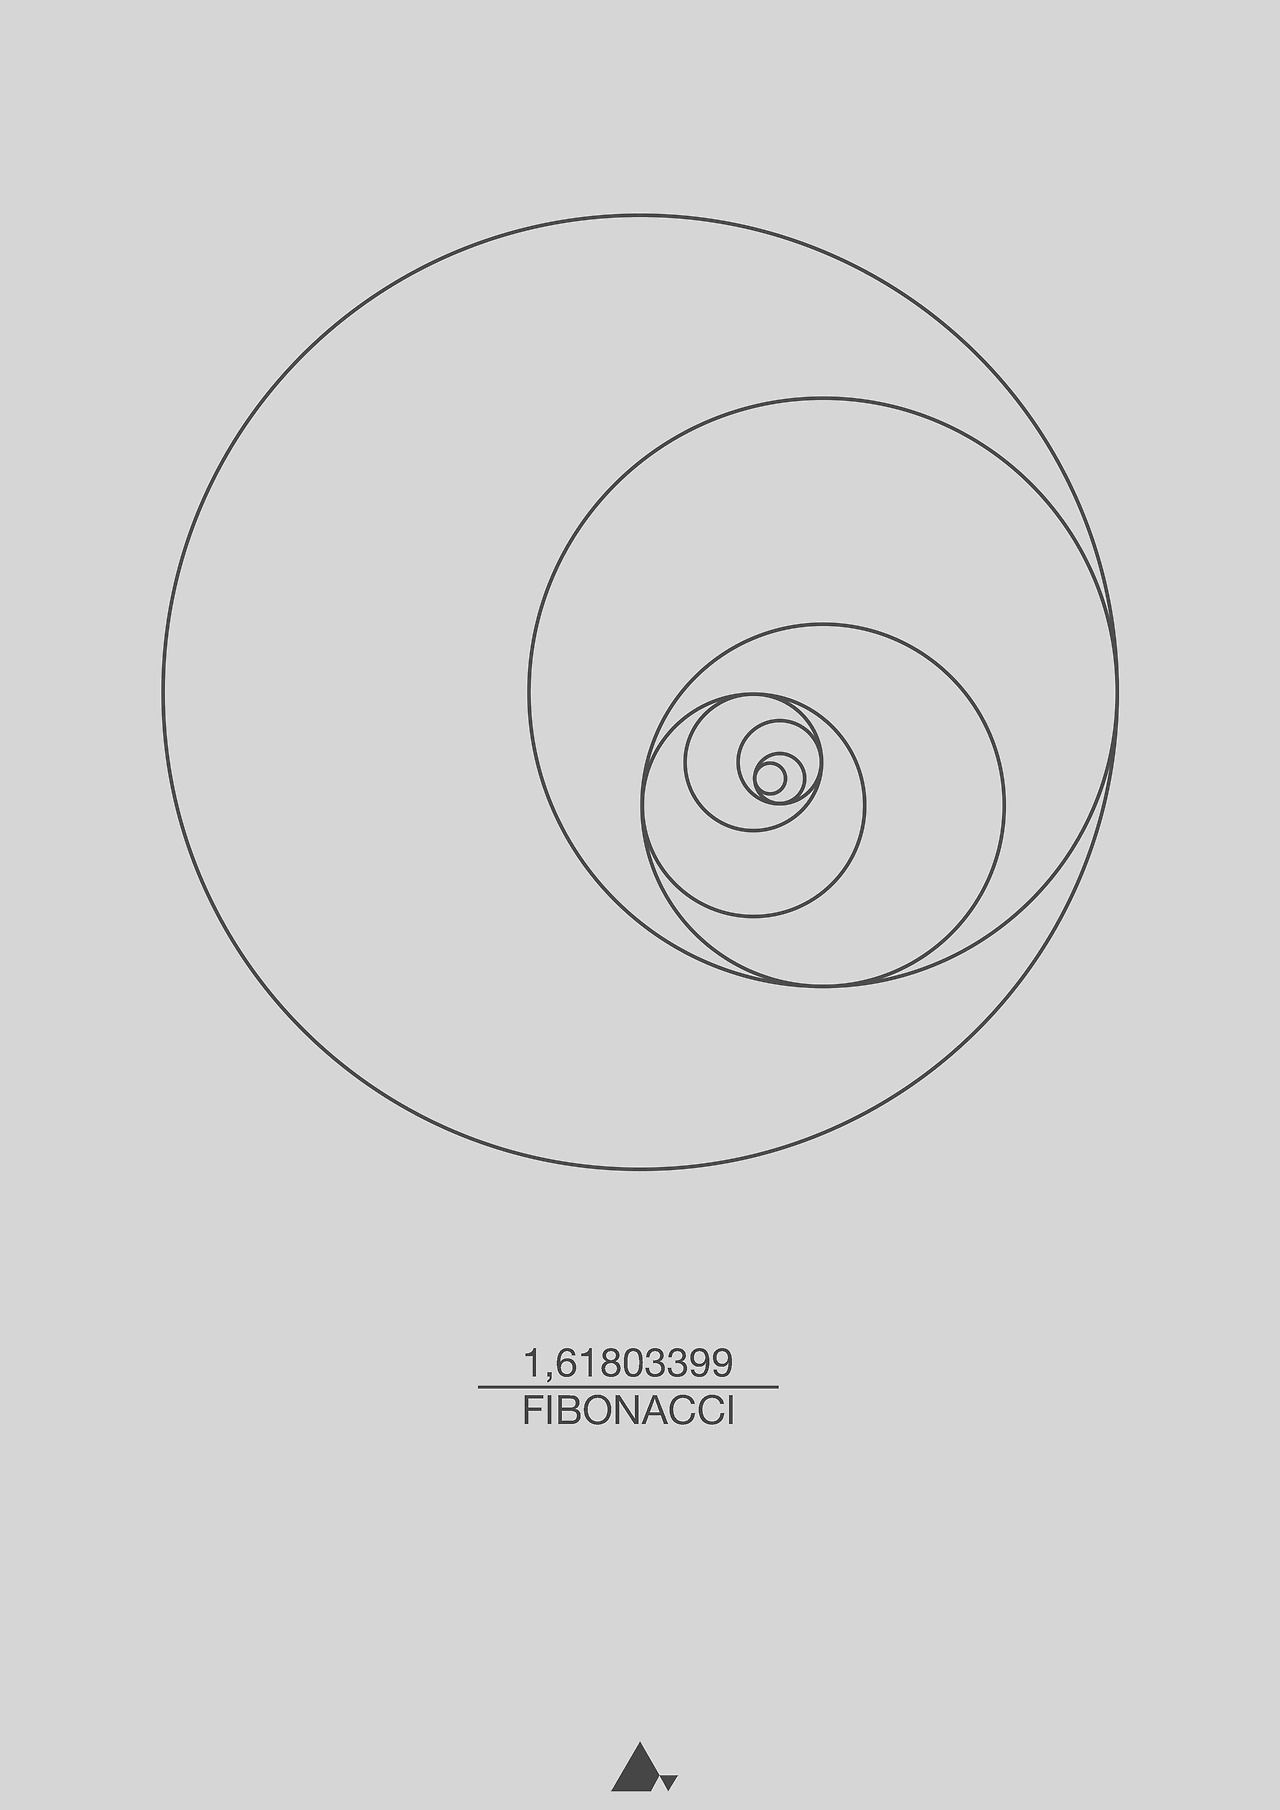 Fibonacci Sequence Circle Print 60x80 Cm Fibonacci Italian Mathematician Of The 12th